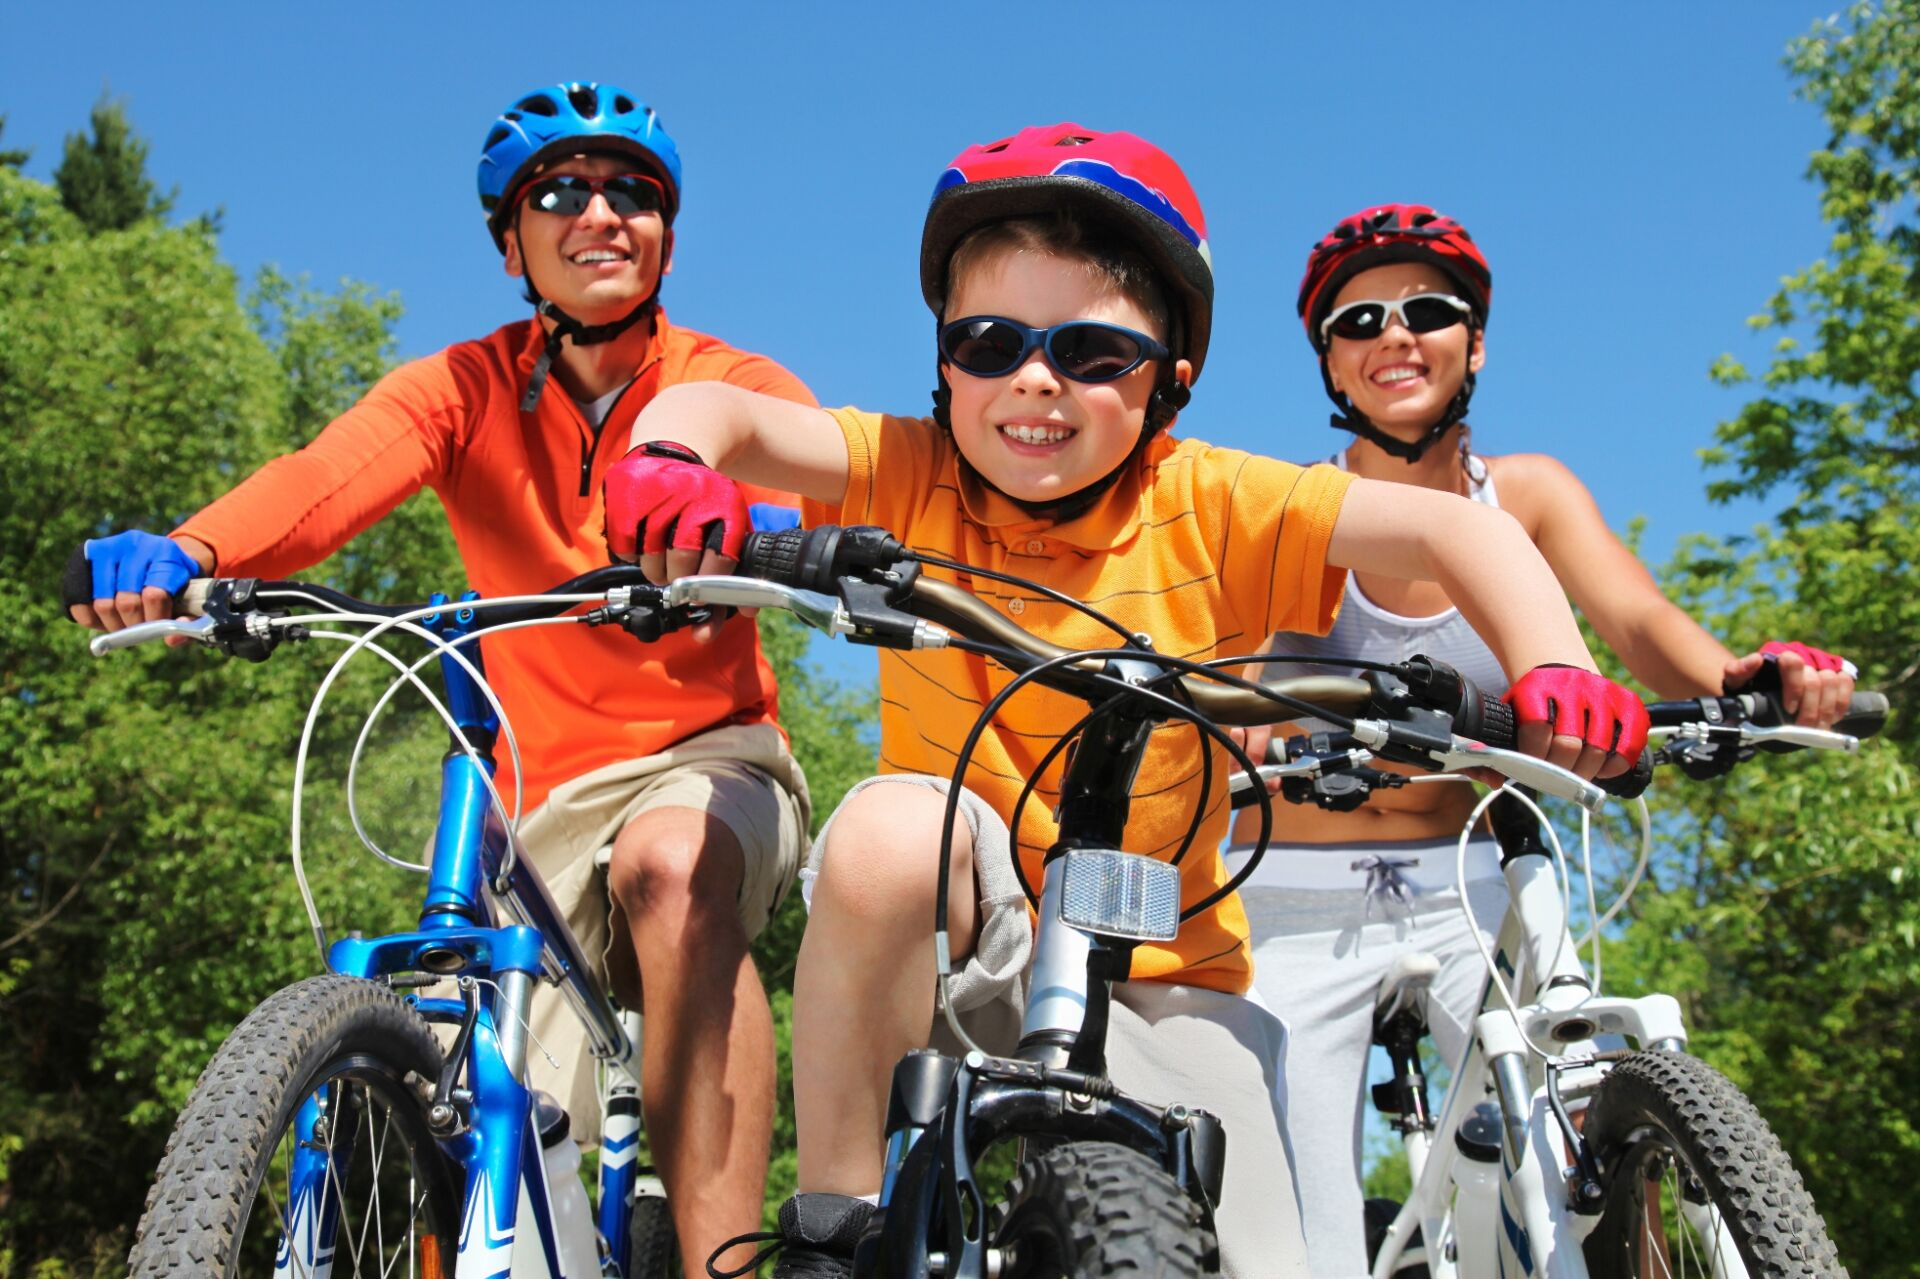 Fahrradtour in den Ferien